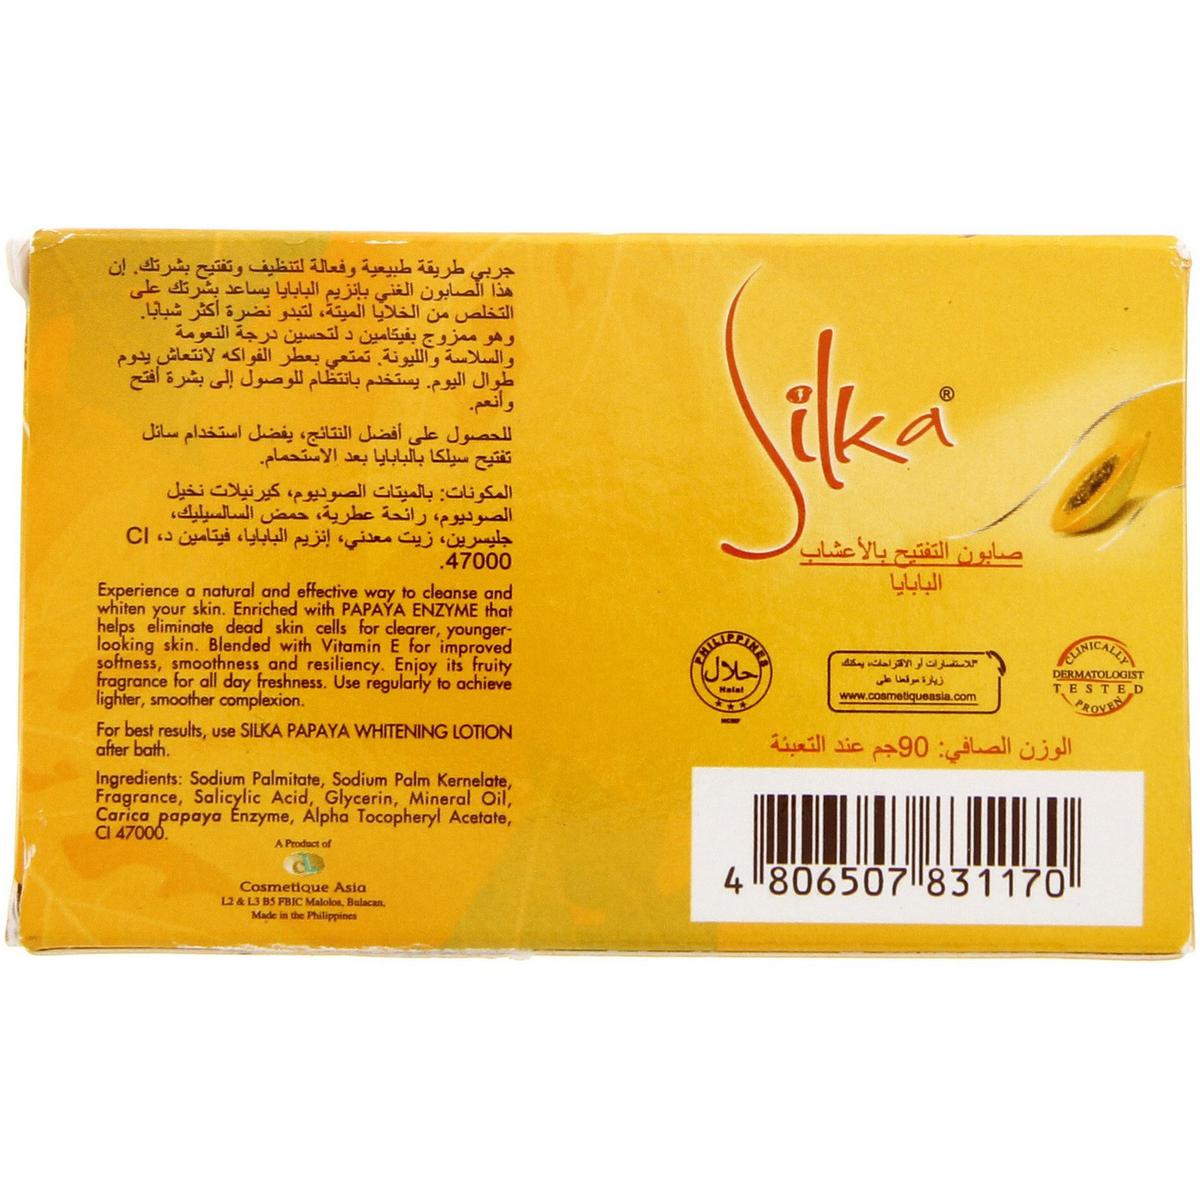 Buy Silka Whitening Herbal Soap 90g - Bath Soaps - Lulu